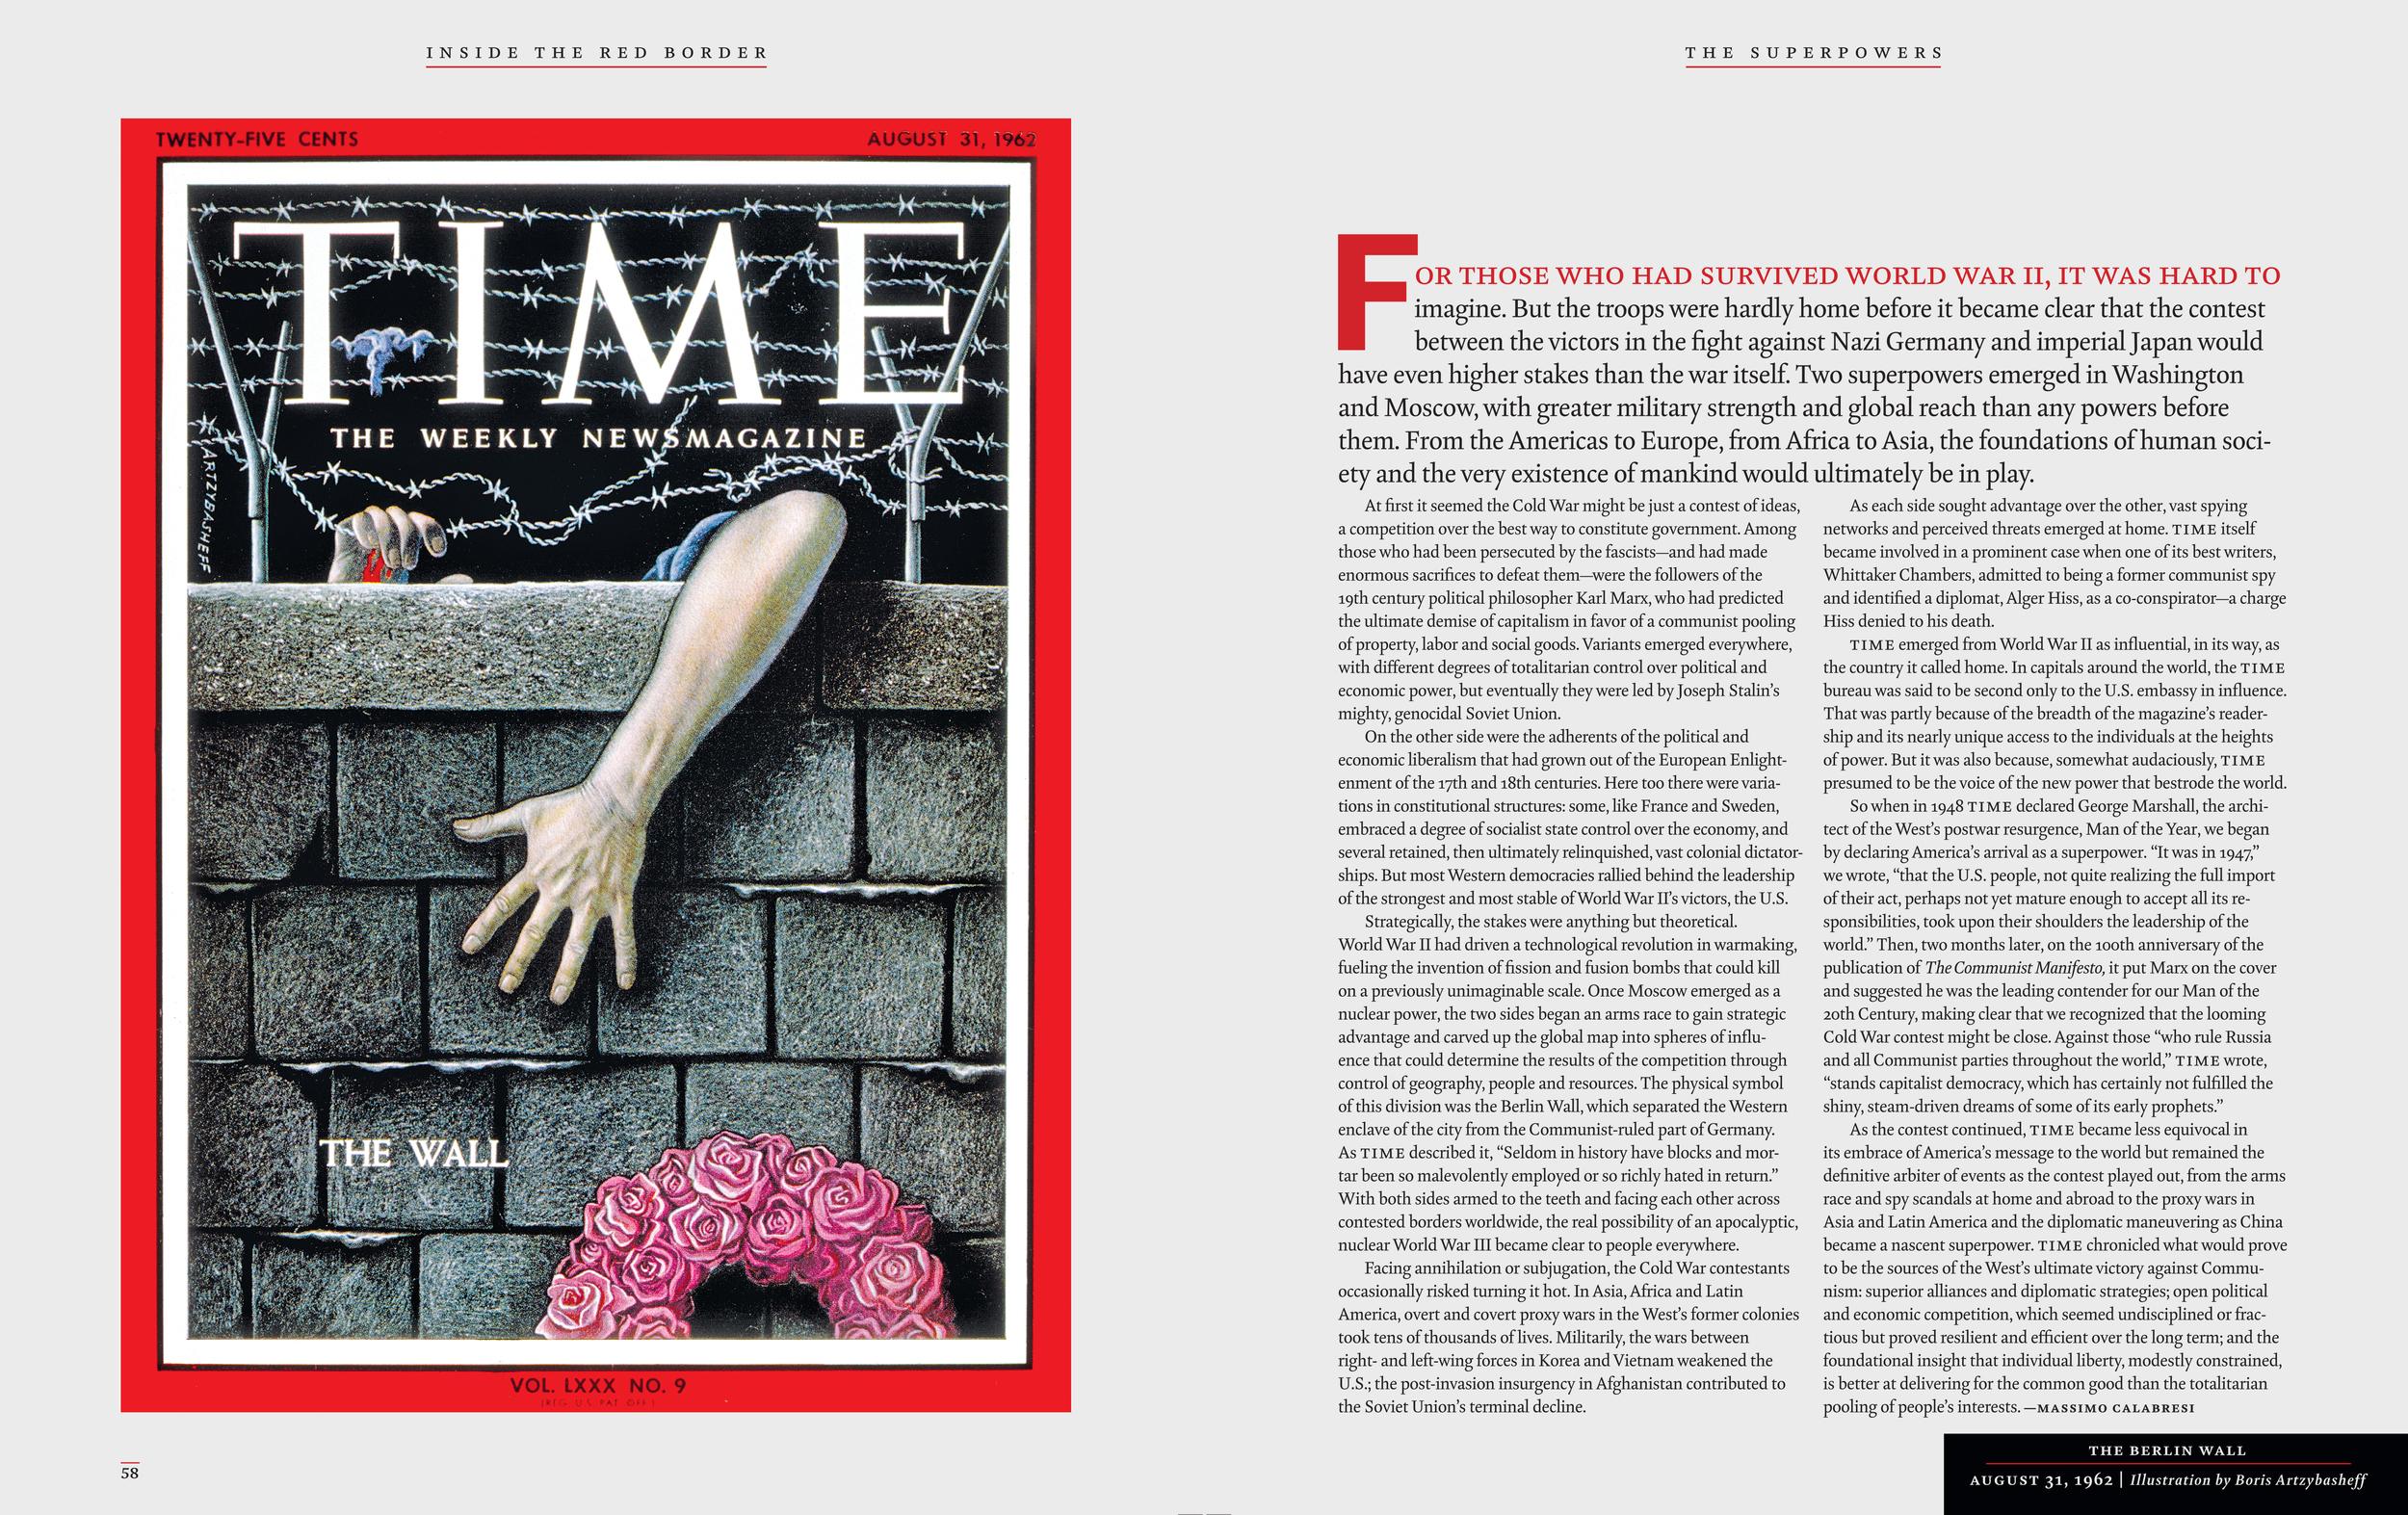 TIME_BK_INSIDE-THE-RED-BORDER_superpower_lede.jpg